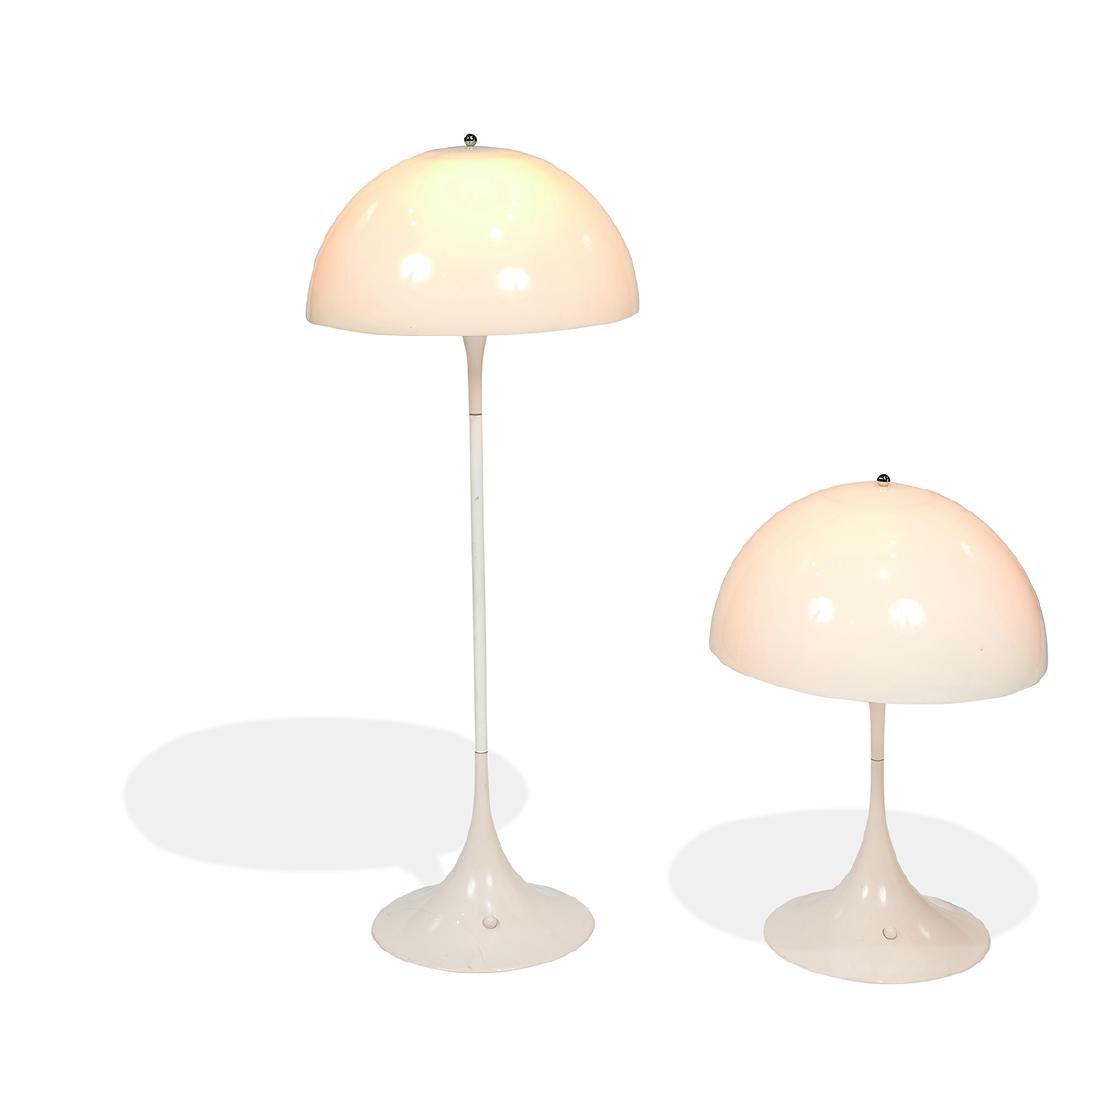 Verner Panton / L. Poulsen 'Panthella' lamps, two